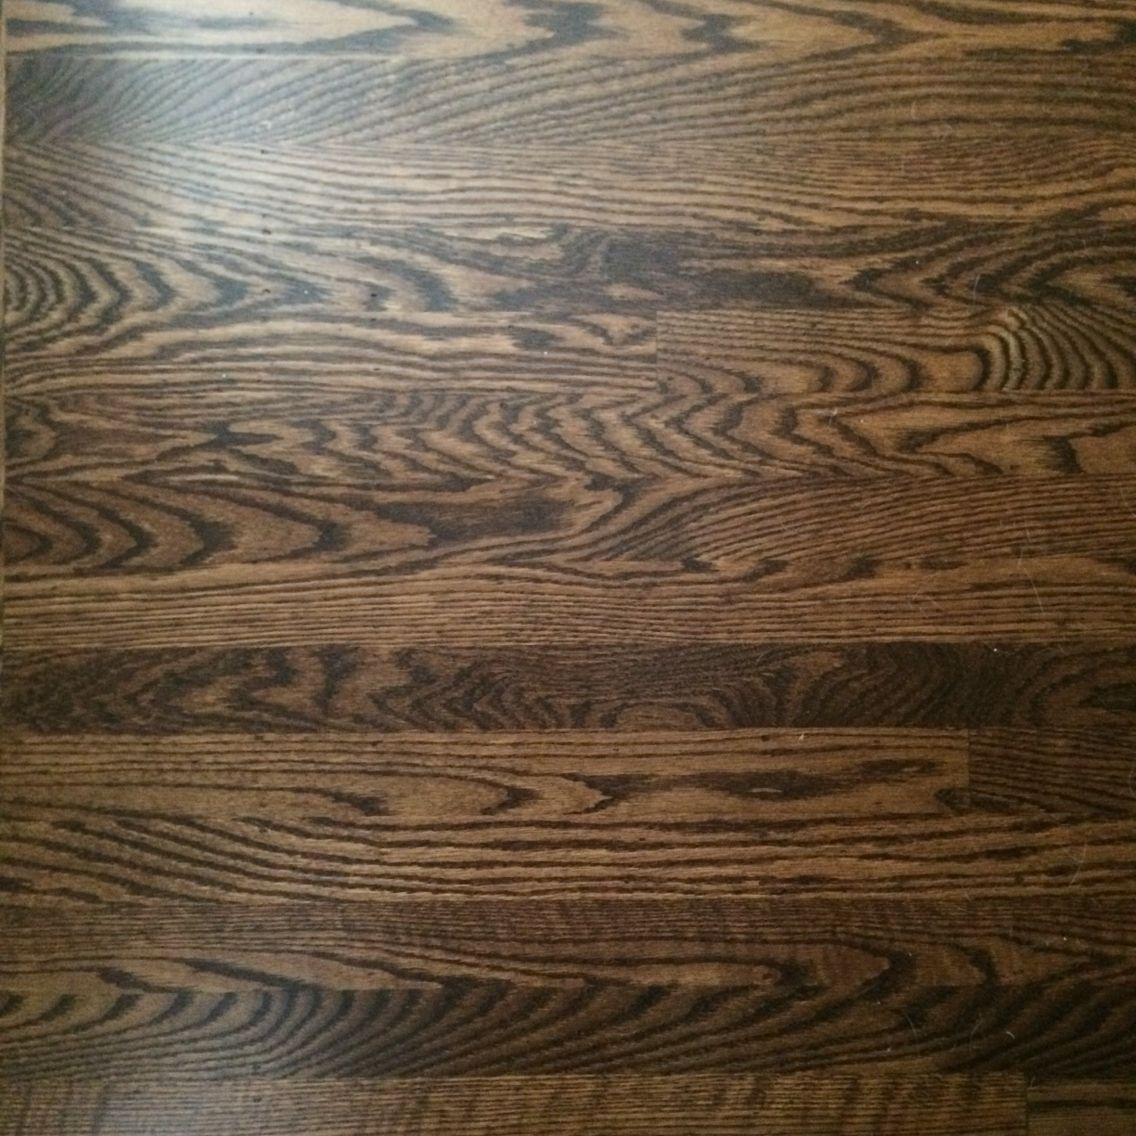 Dark Stained Oak Floors: Dark Walnut White Oak Floors To Match Rest Of The House